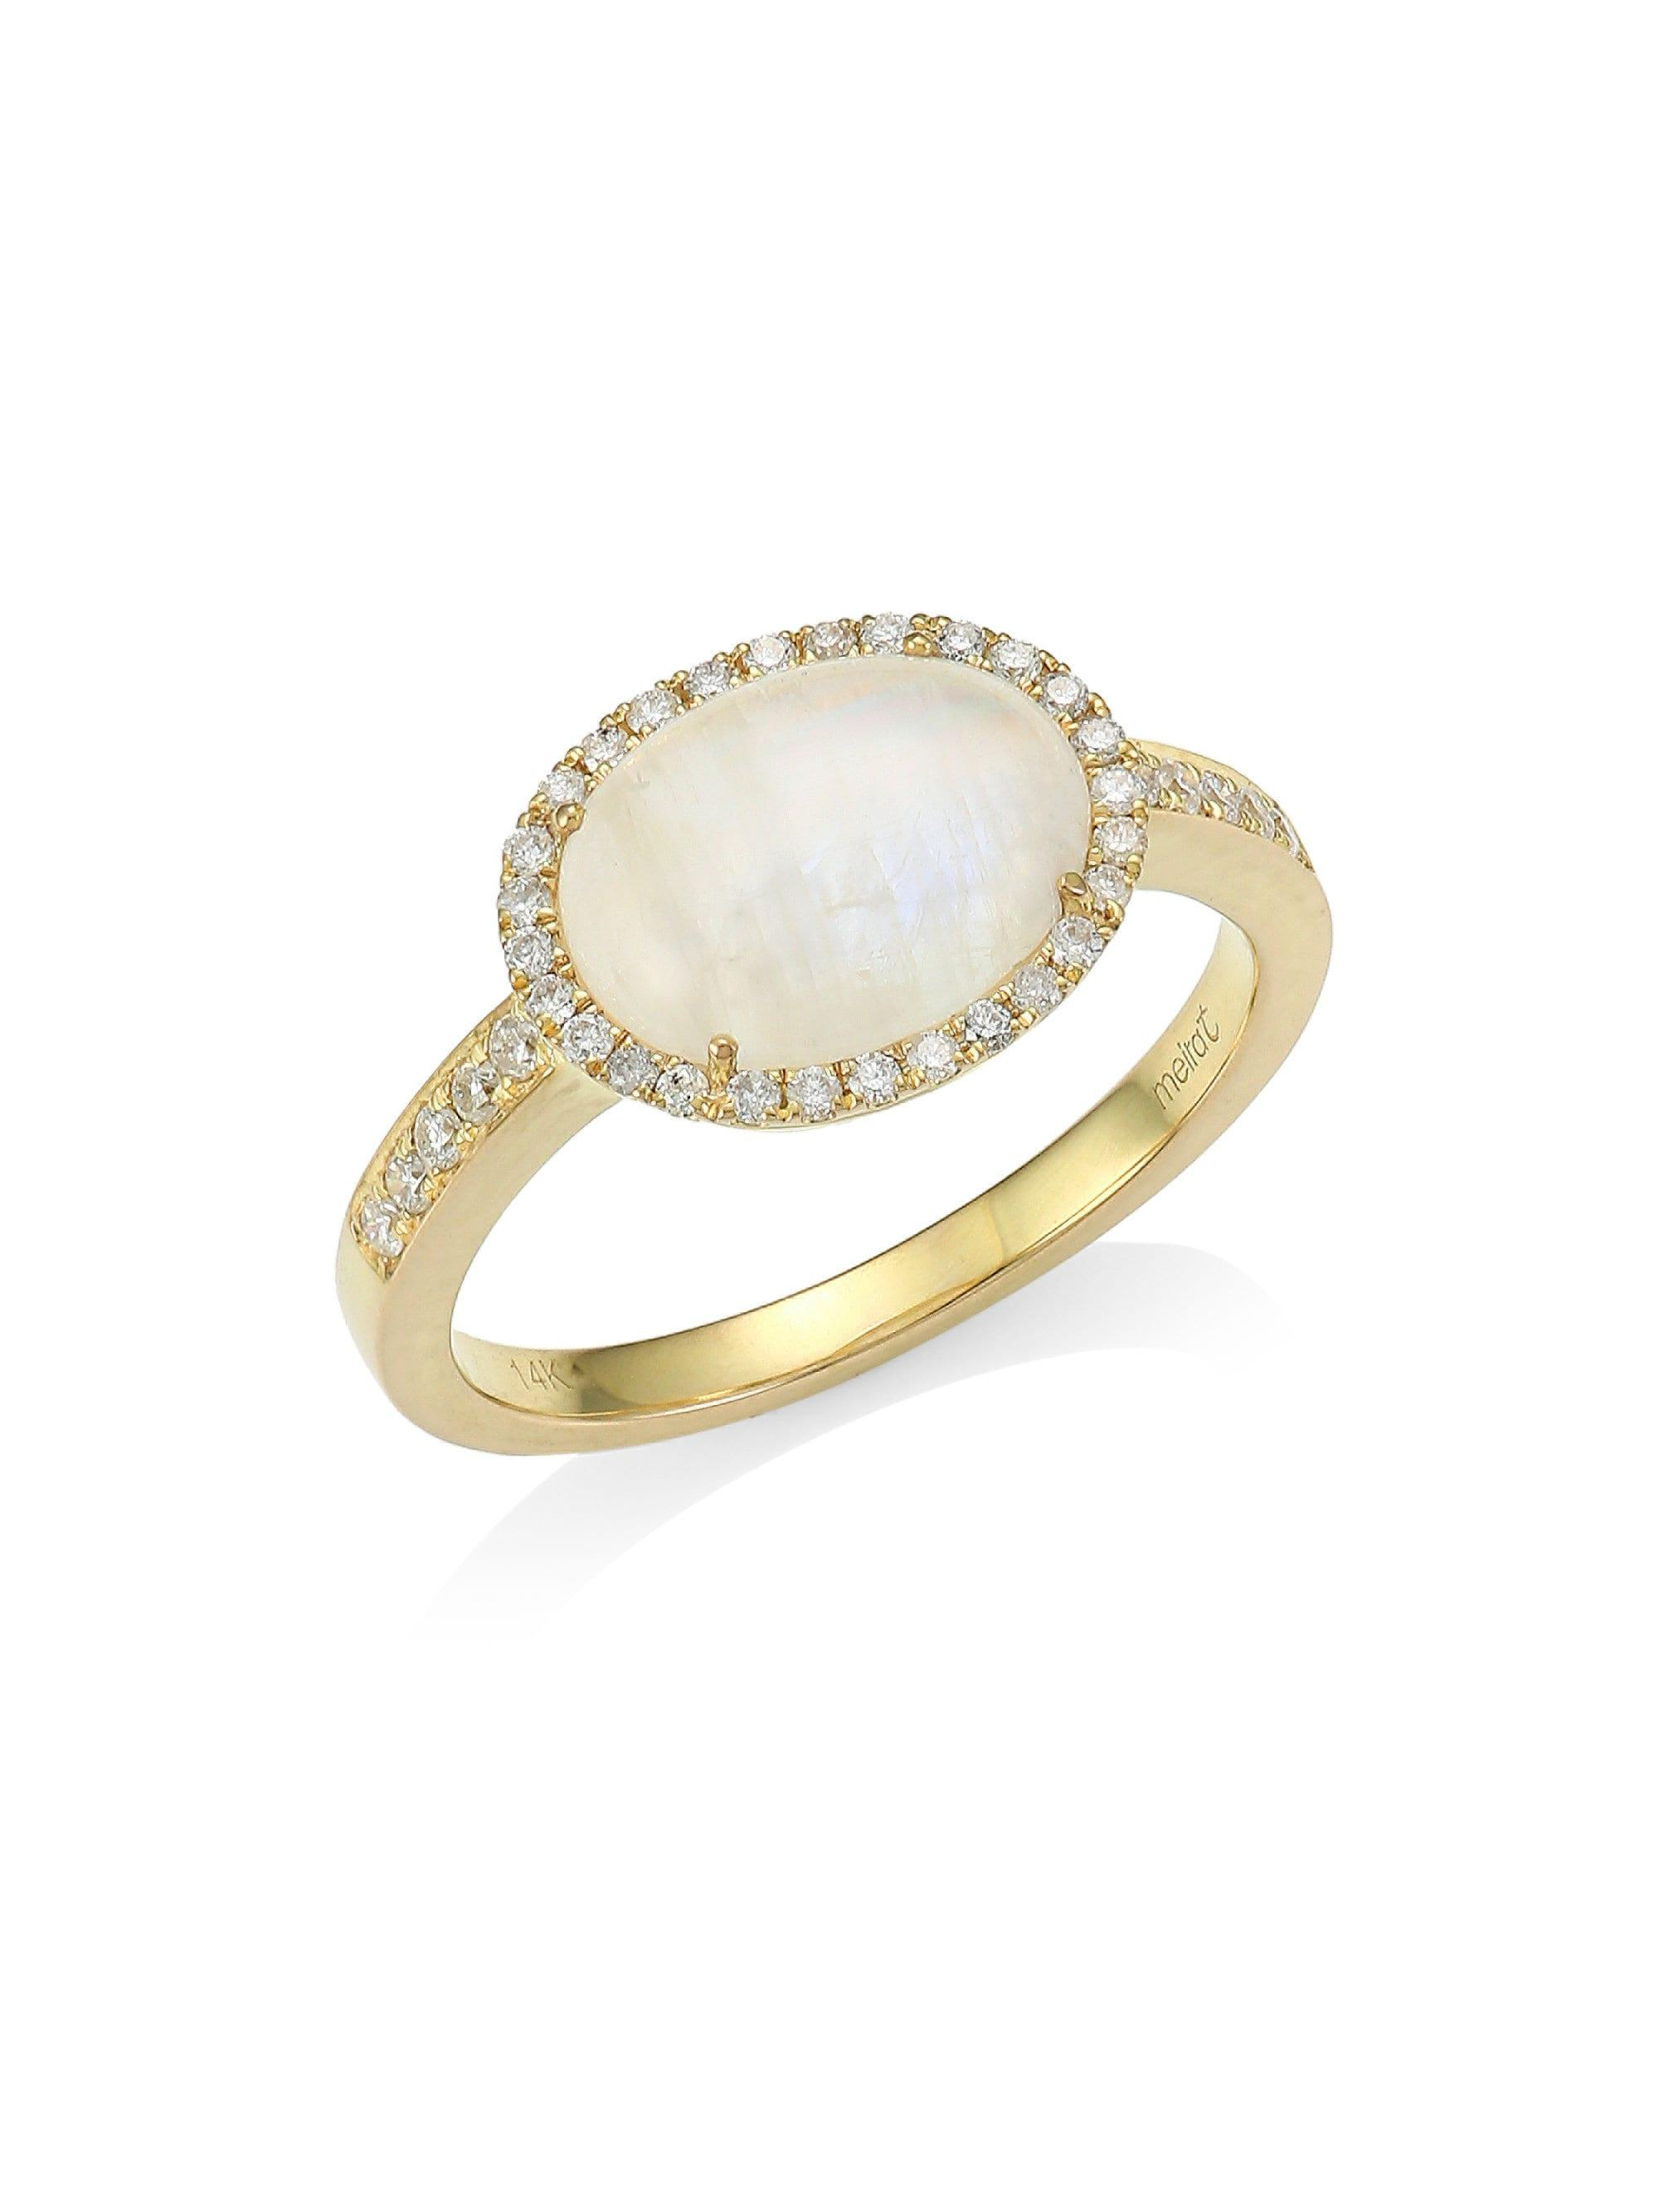 Meira T 14-Karat Yellow Gold, Diamond, and Rainbow Moonstone ring